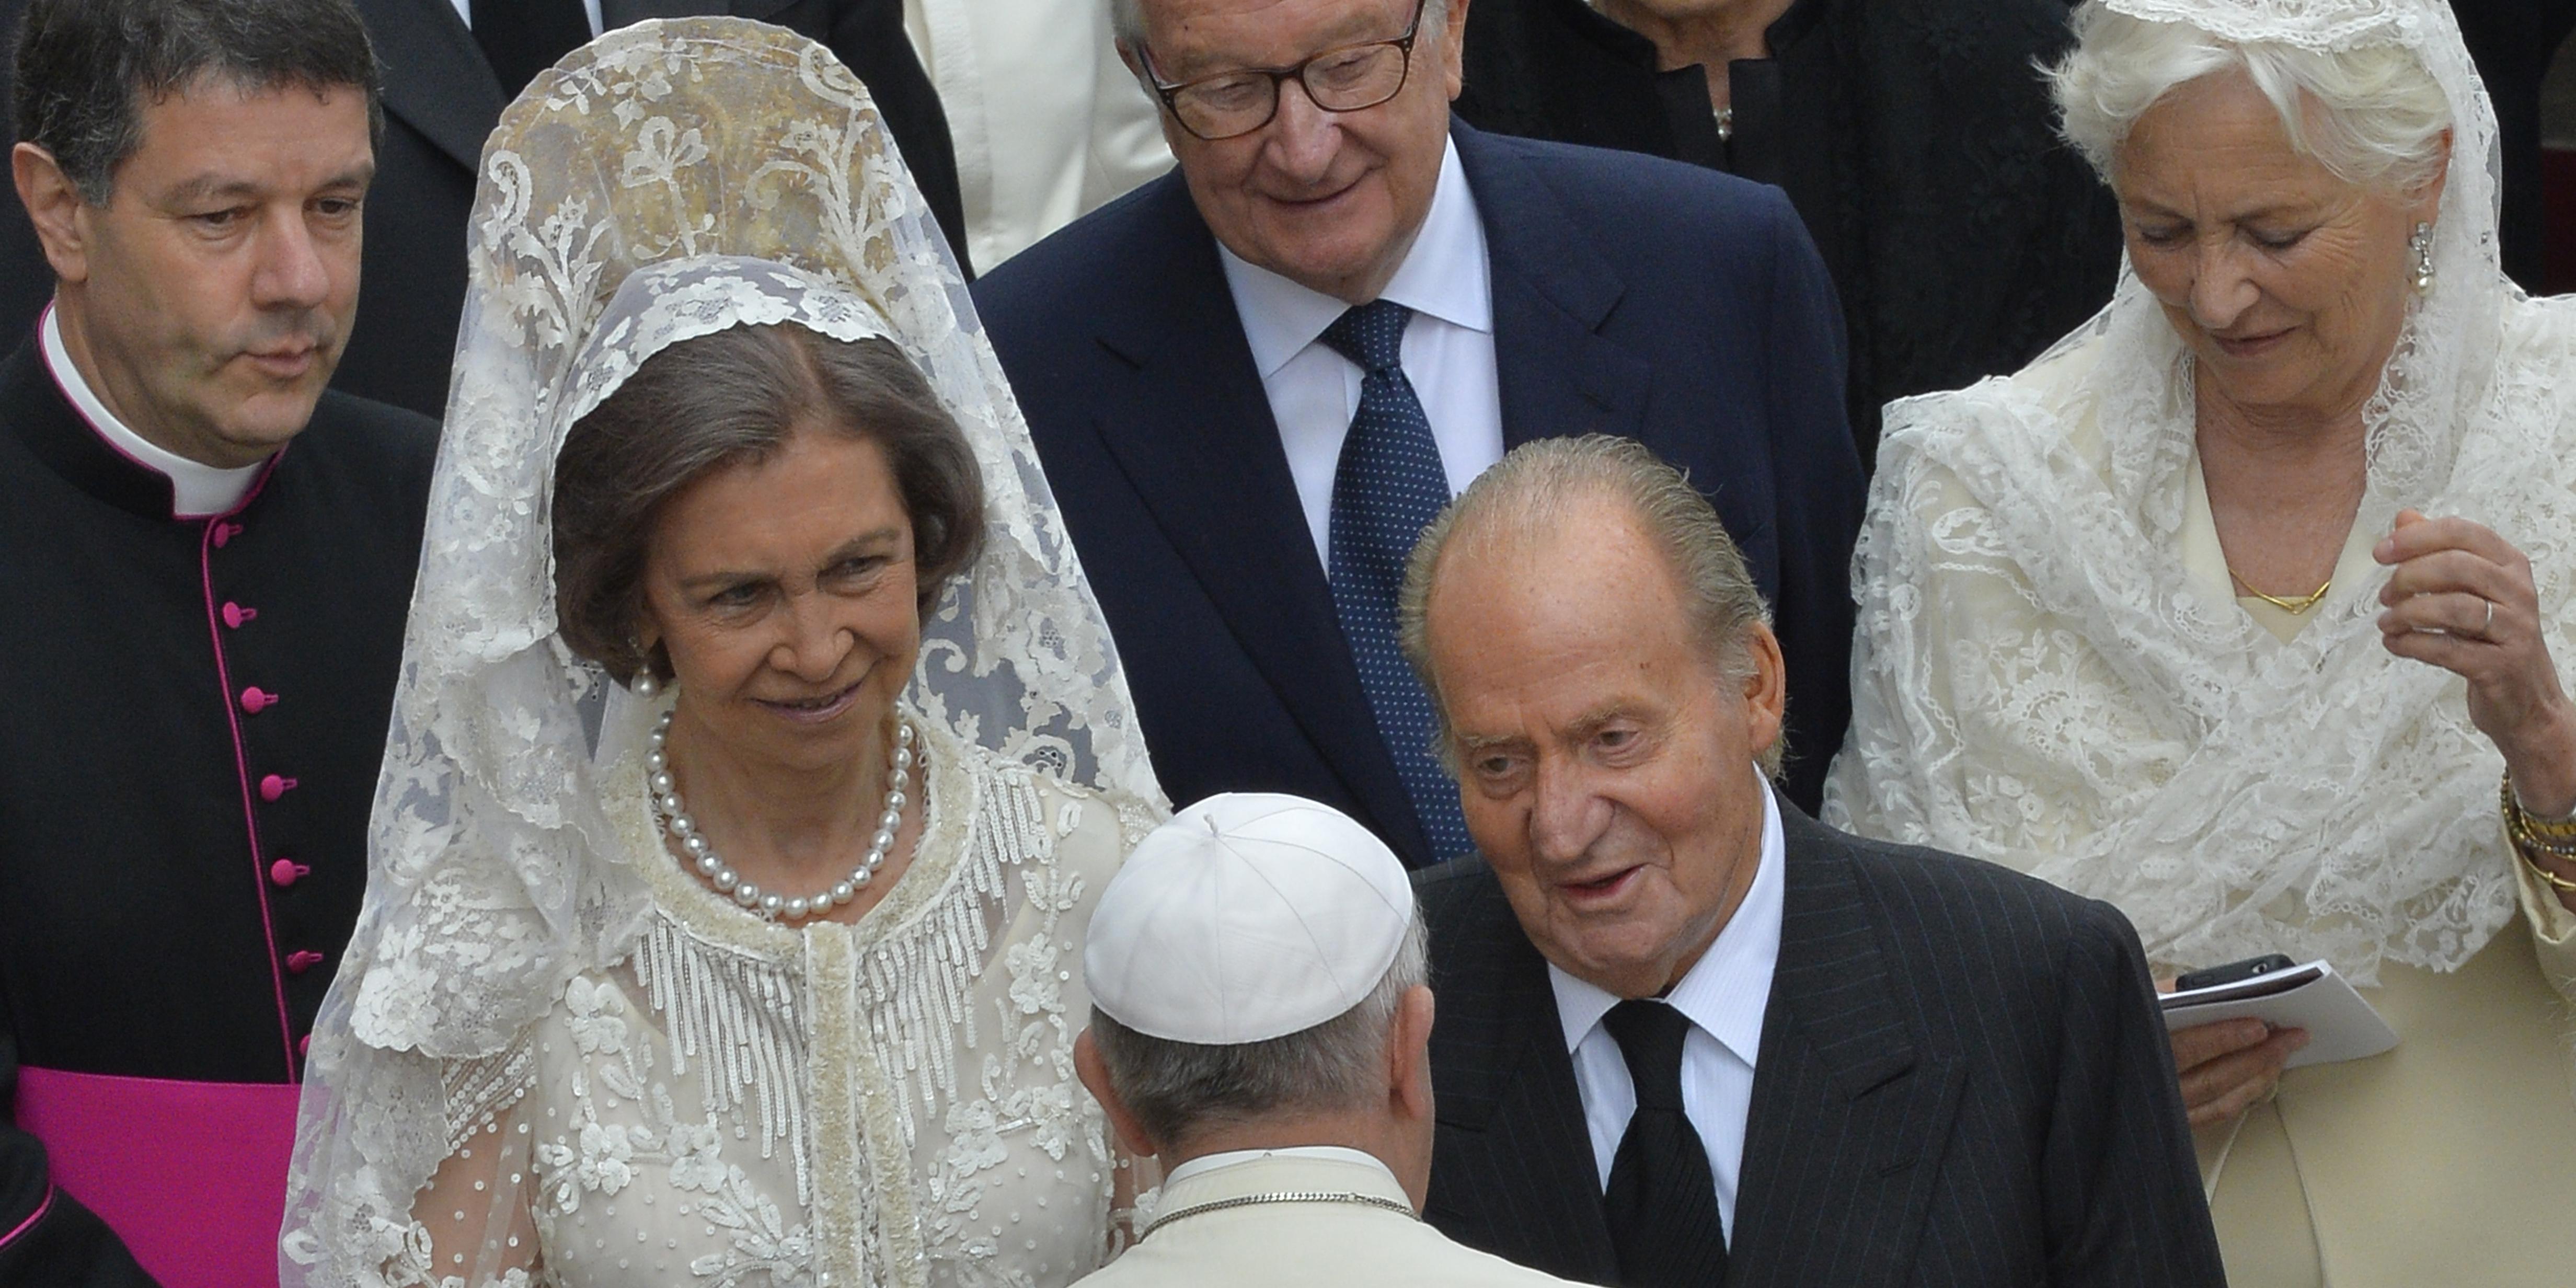 SPAIN ROYAL POPE